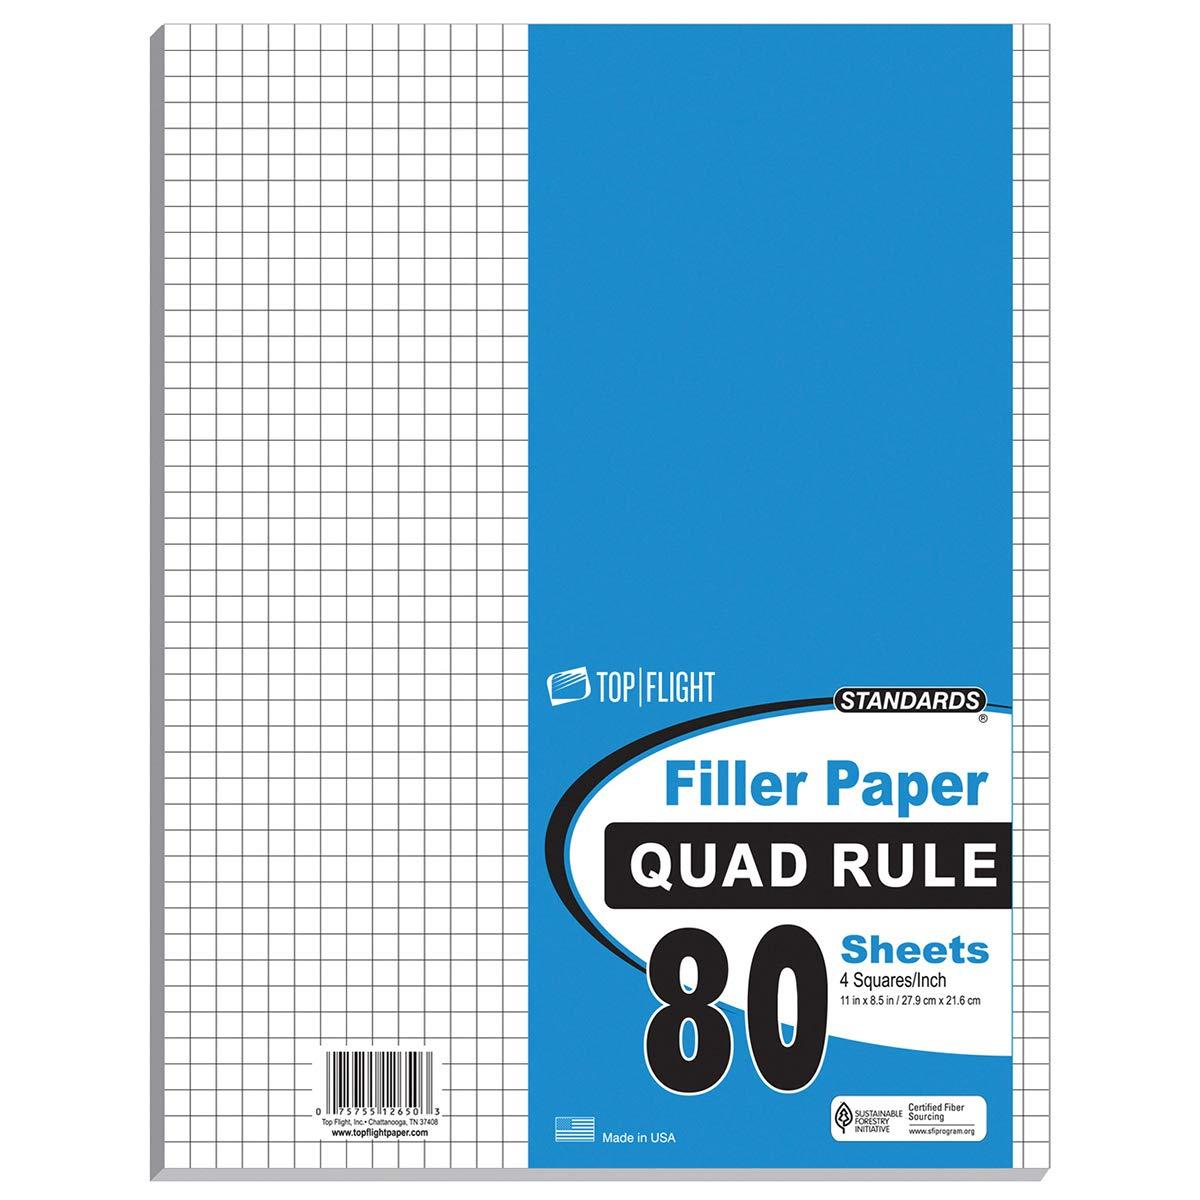 80 Count Quad Ruled Filler Paper - 11'' x 8.5'' (Case of 12)